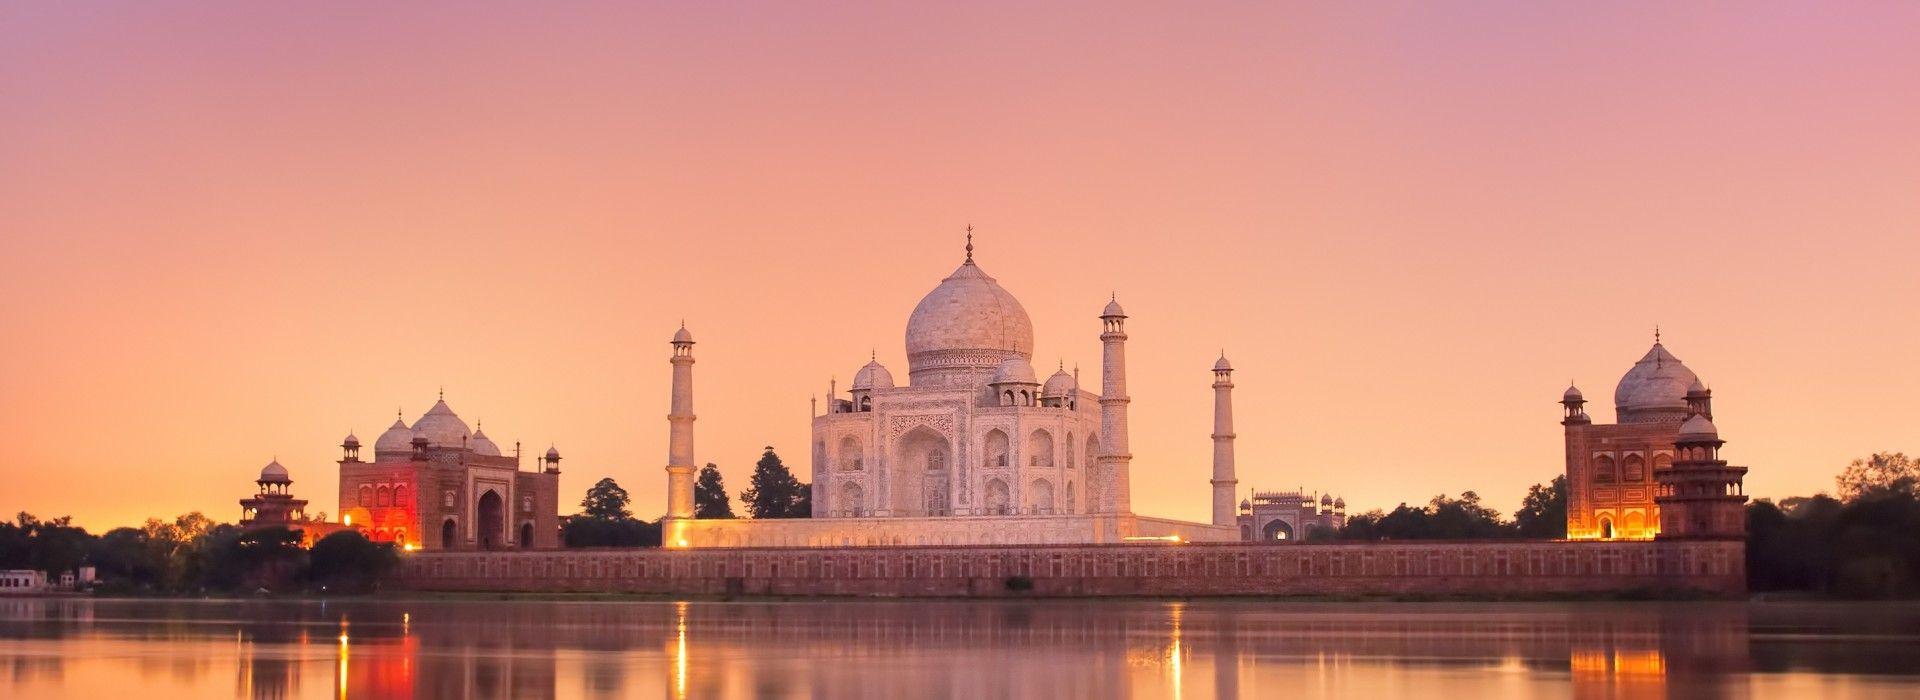 Holi Tours in India